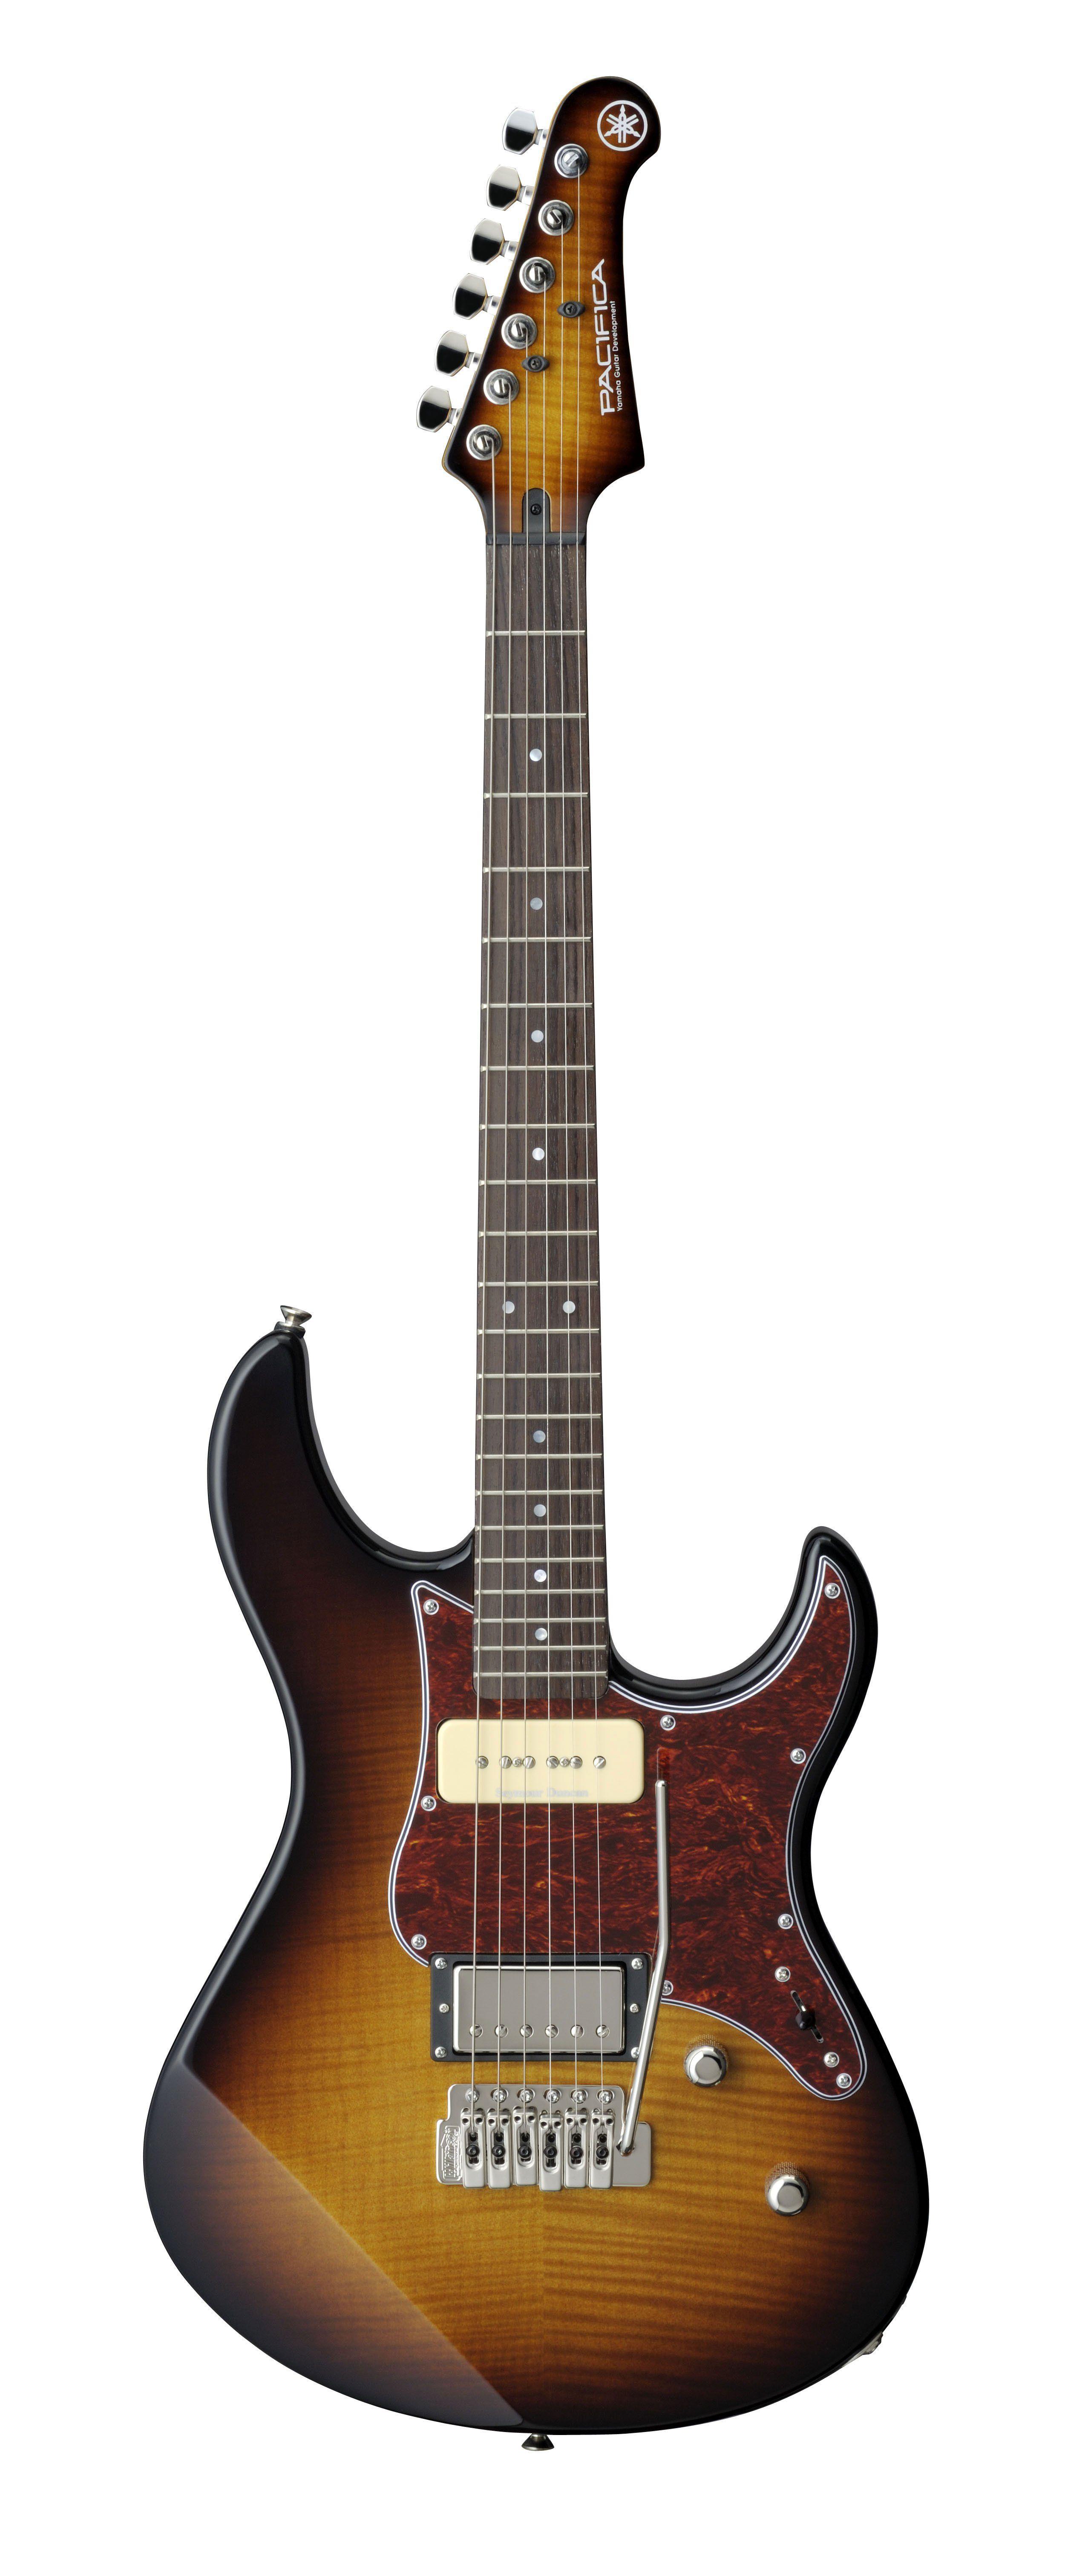 Yamaha Pac611vfm Tobacco Brown Sunburst Electric Guitar In 2020 Yamaha Guitar Guitar Electric Guitar And Amp